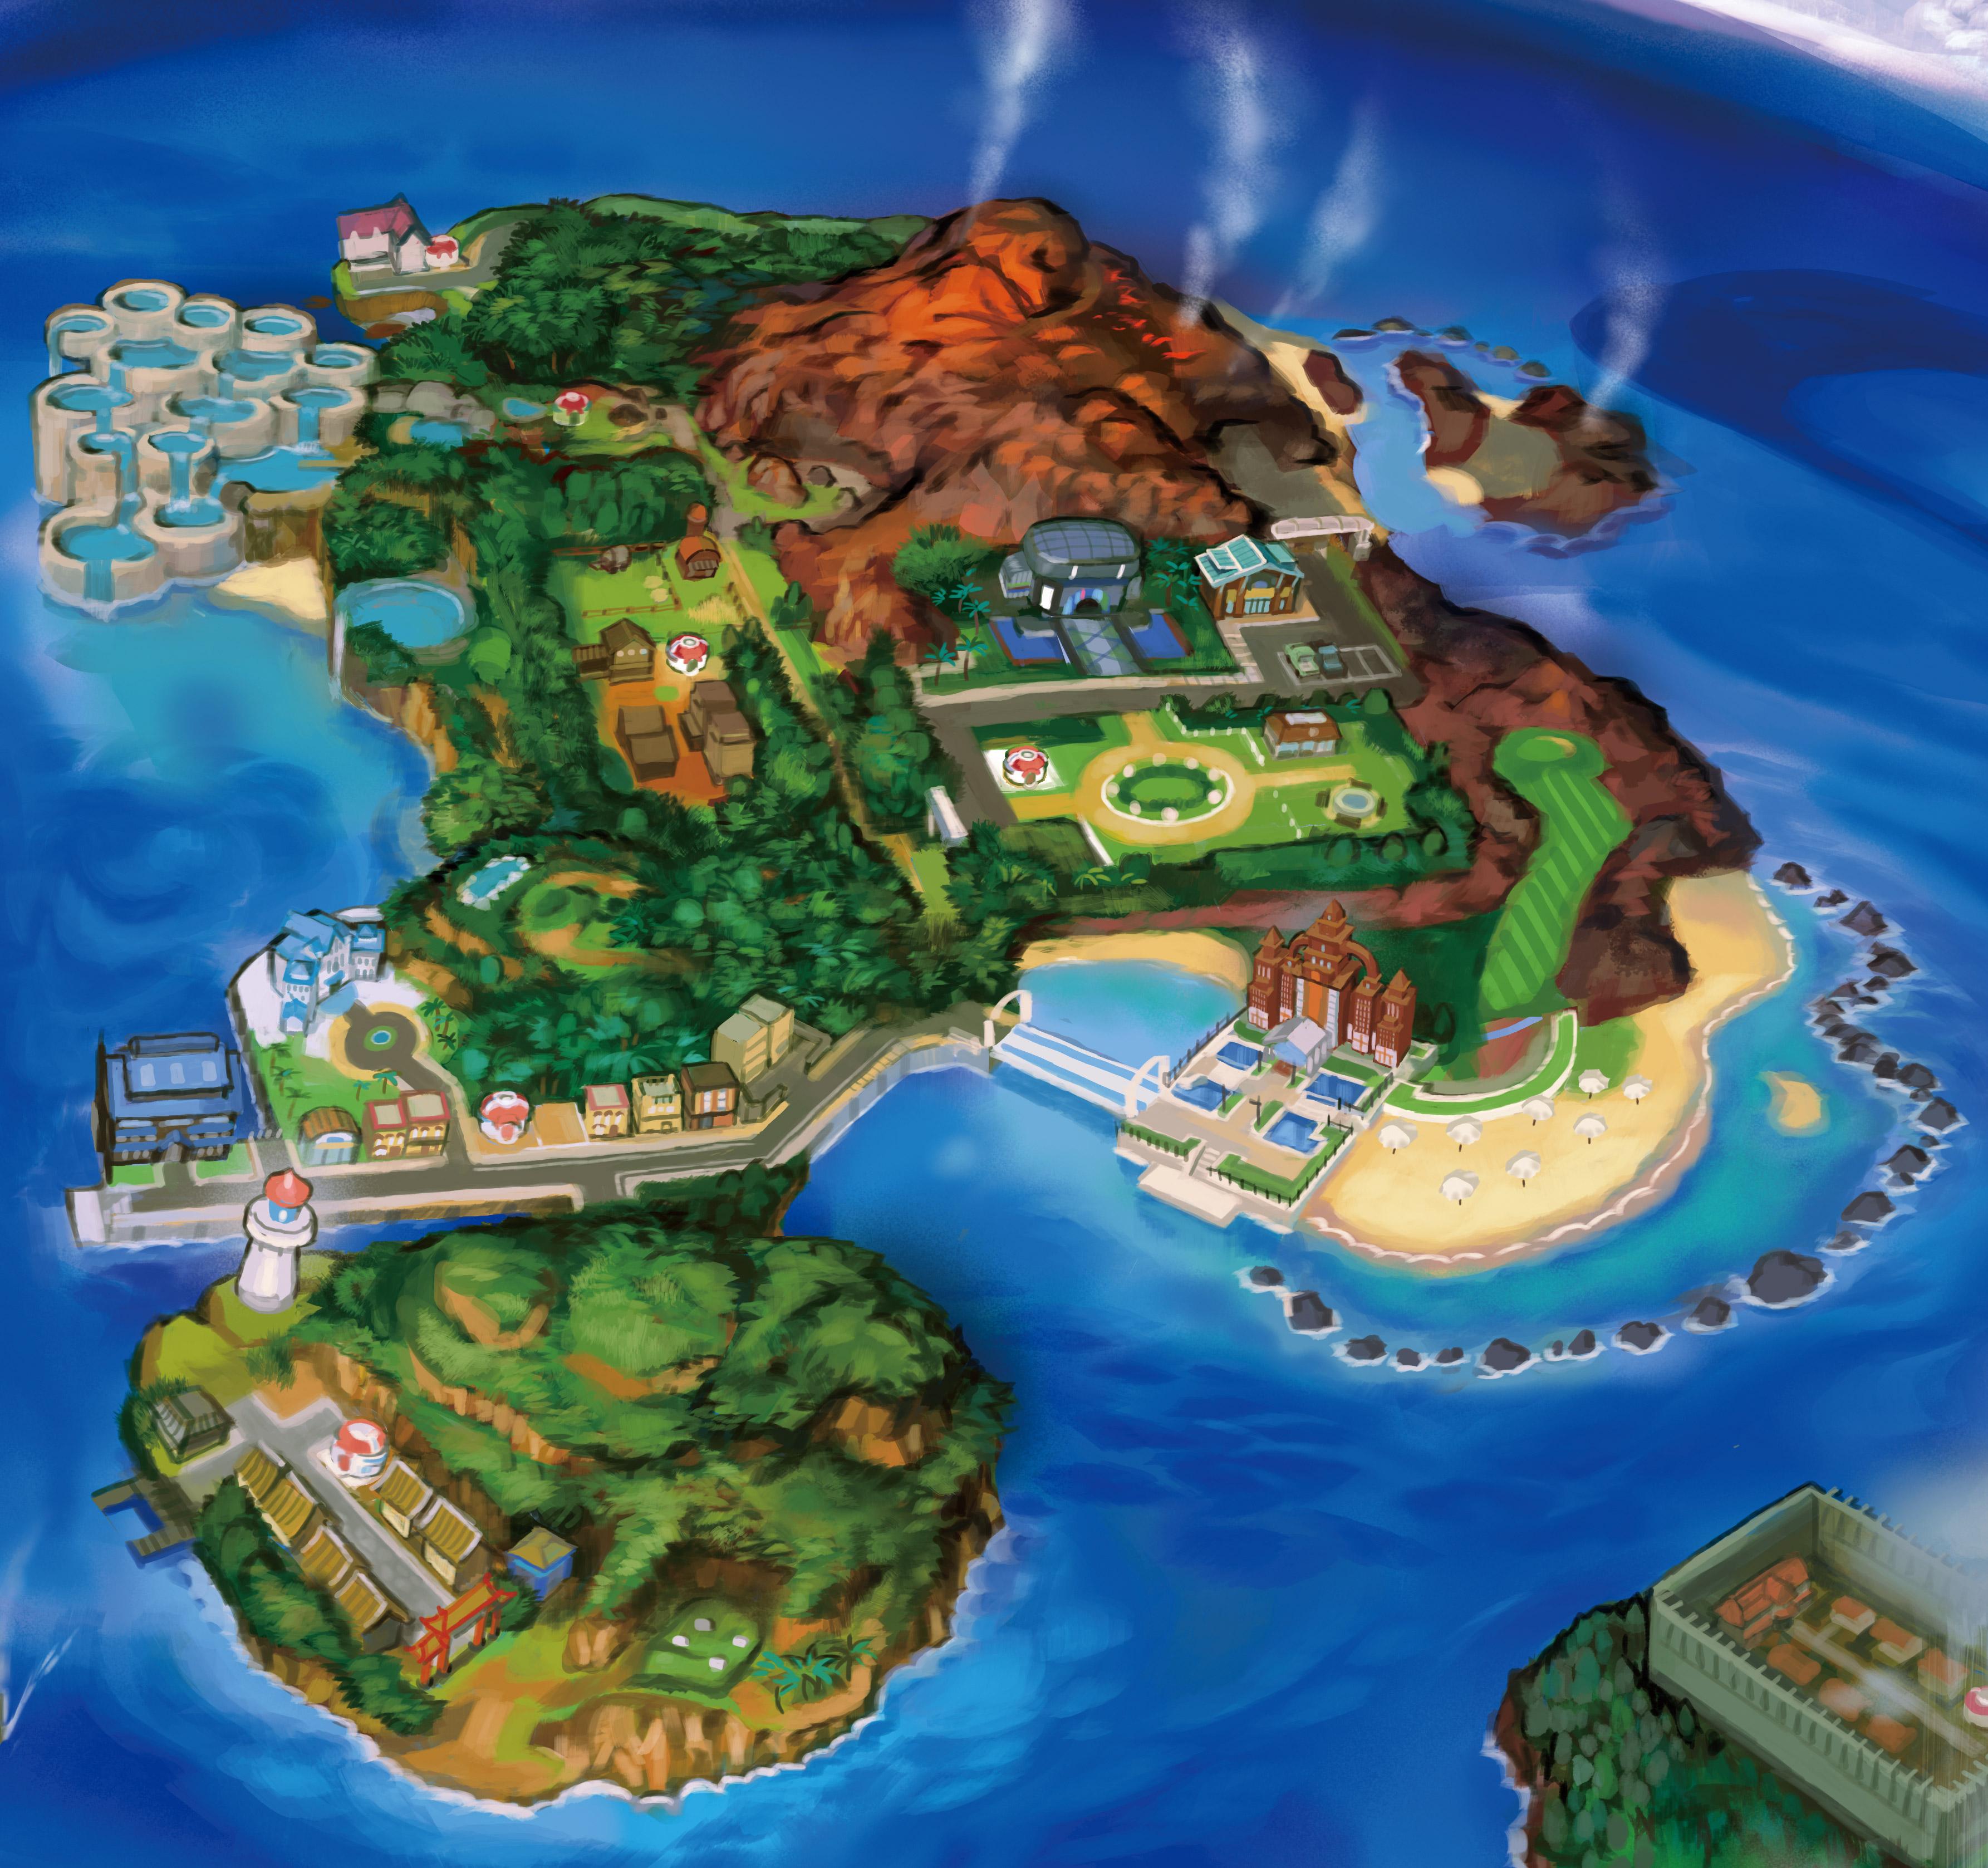 pokemon y map with Pokemon Lune Soleil Analyse Du Trailer Du 02 06 16 on Chicas De  pras 02 besides plete Rail Map in addition 913 Pokemon Soleil Et Pokemon Lune La Region Dalola together with Mapa general moreover Hoopa Pokemon Pokedex 720.